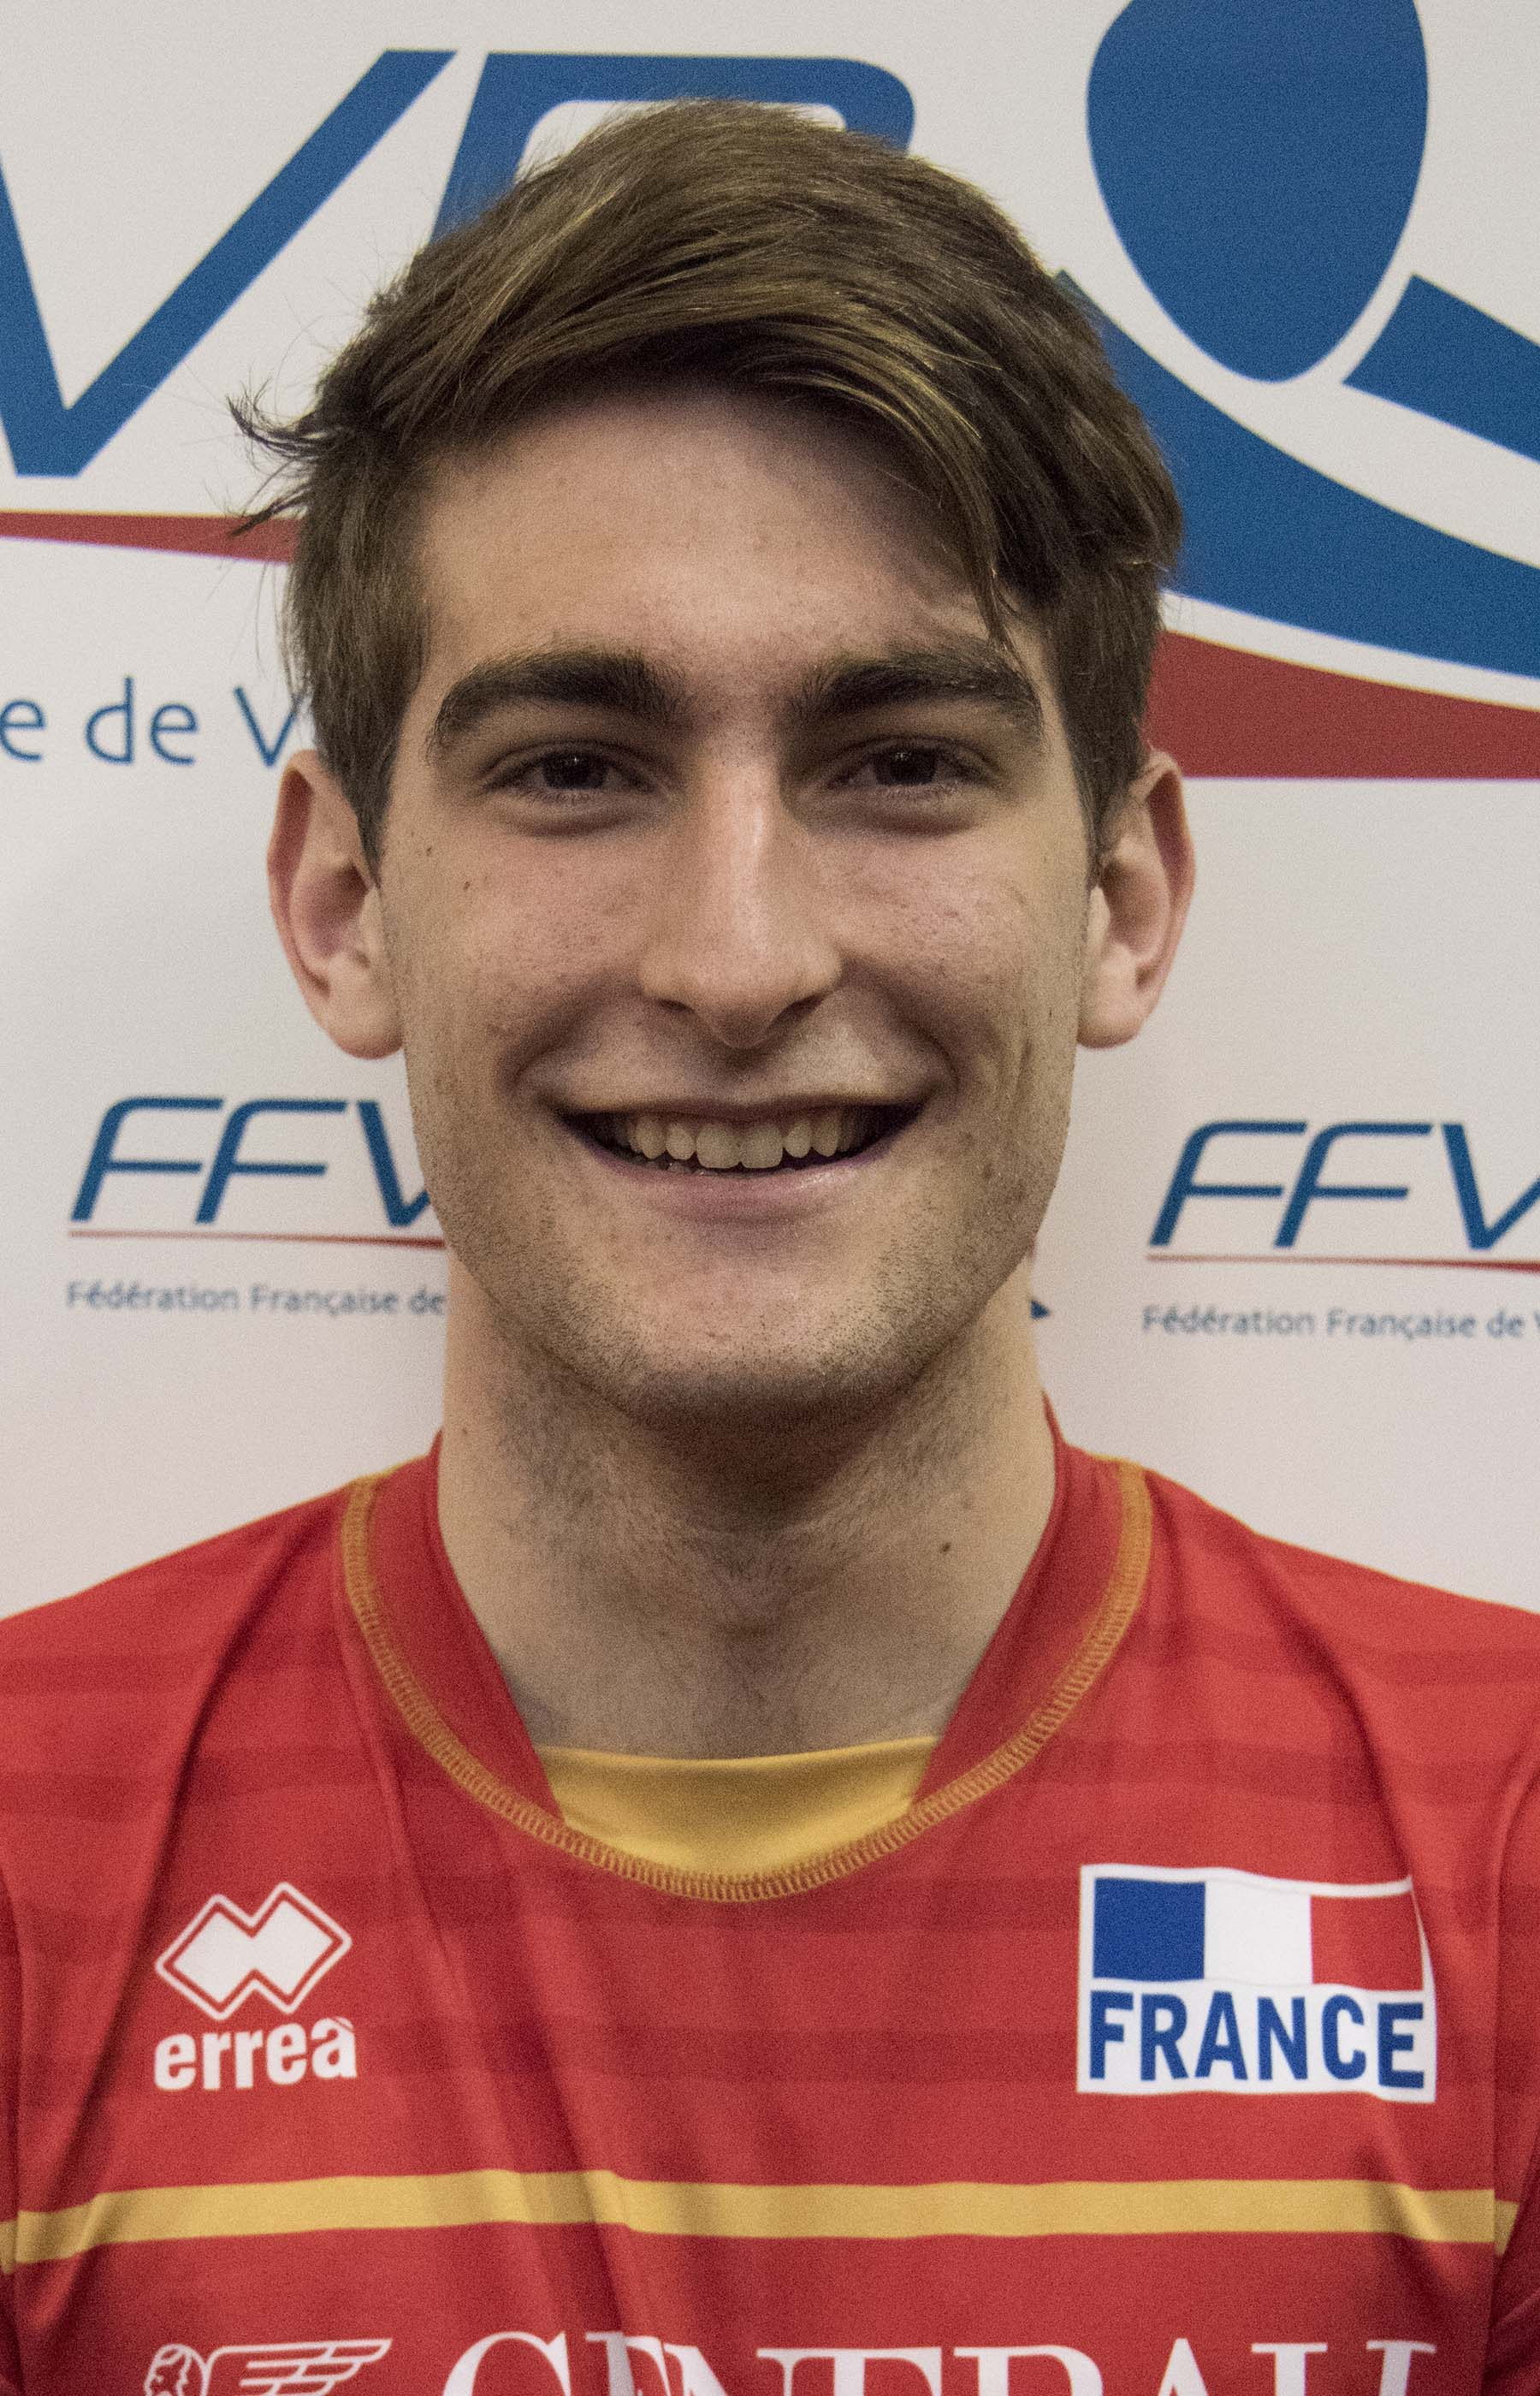 Maxime Laumon